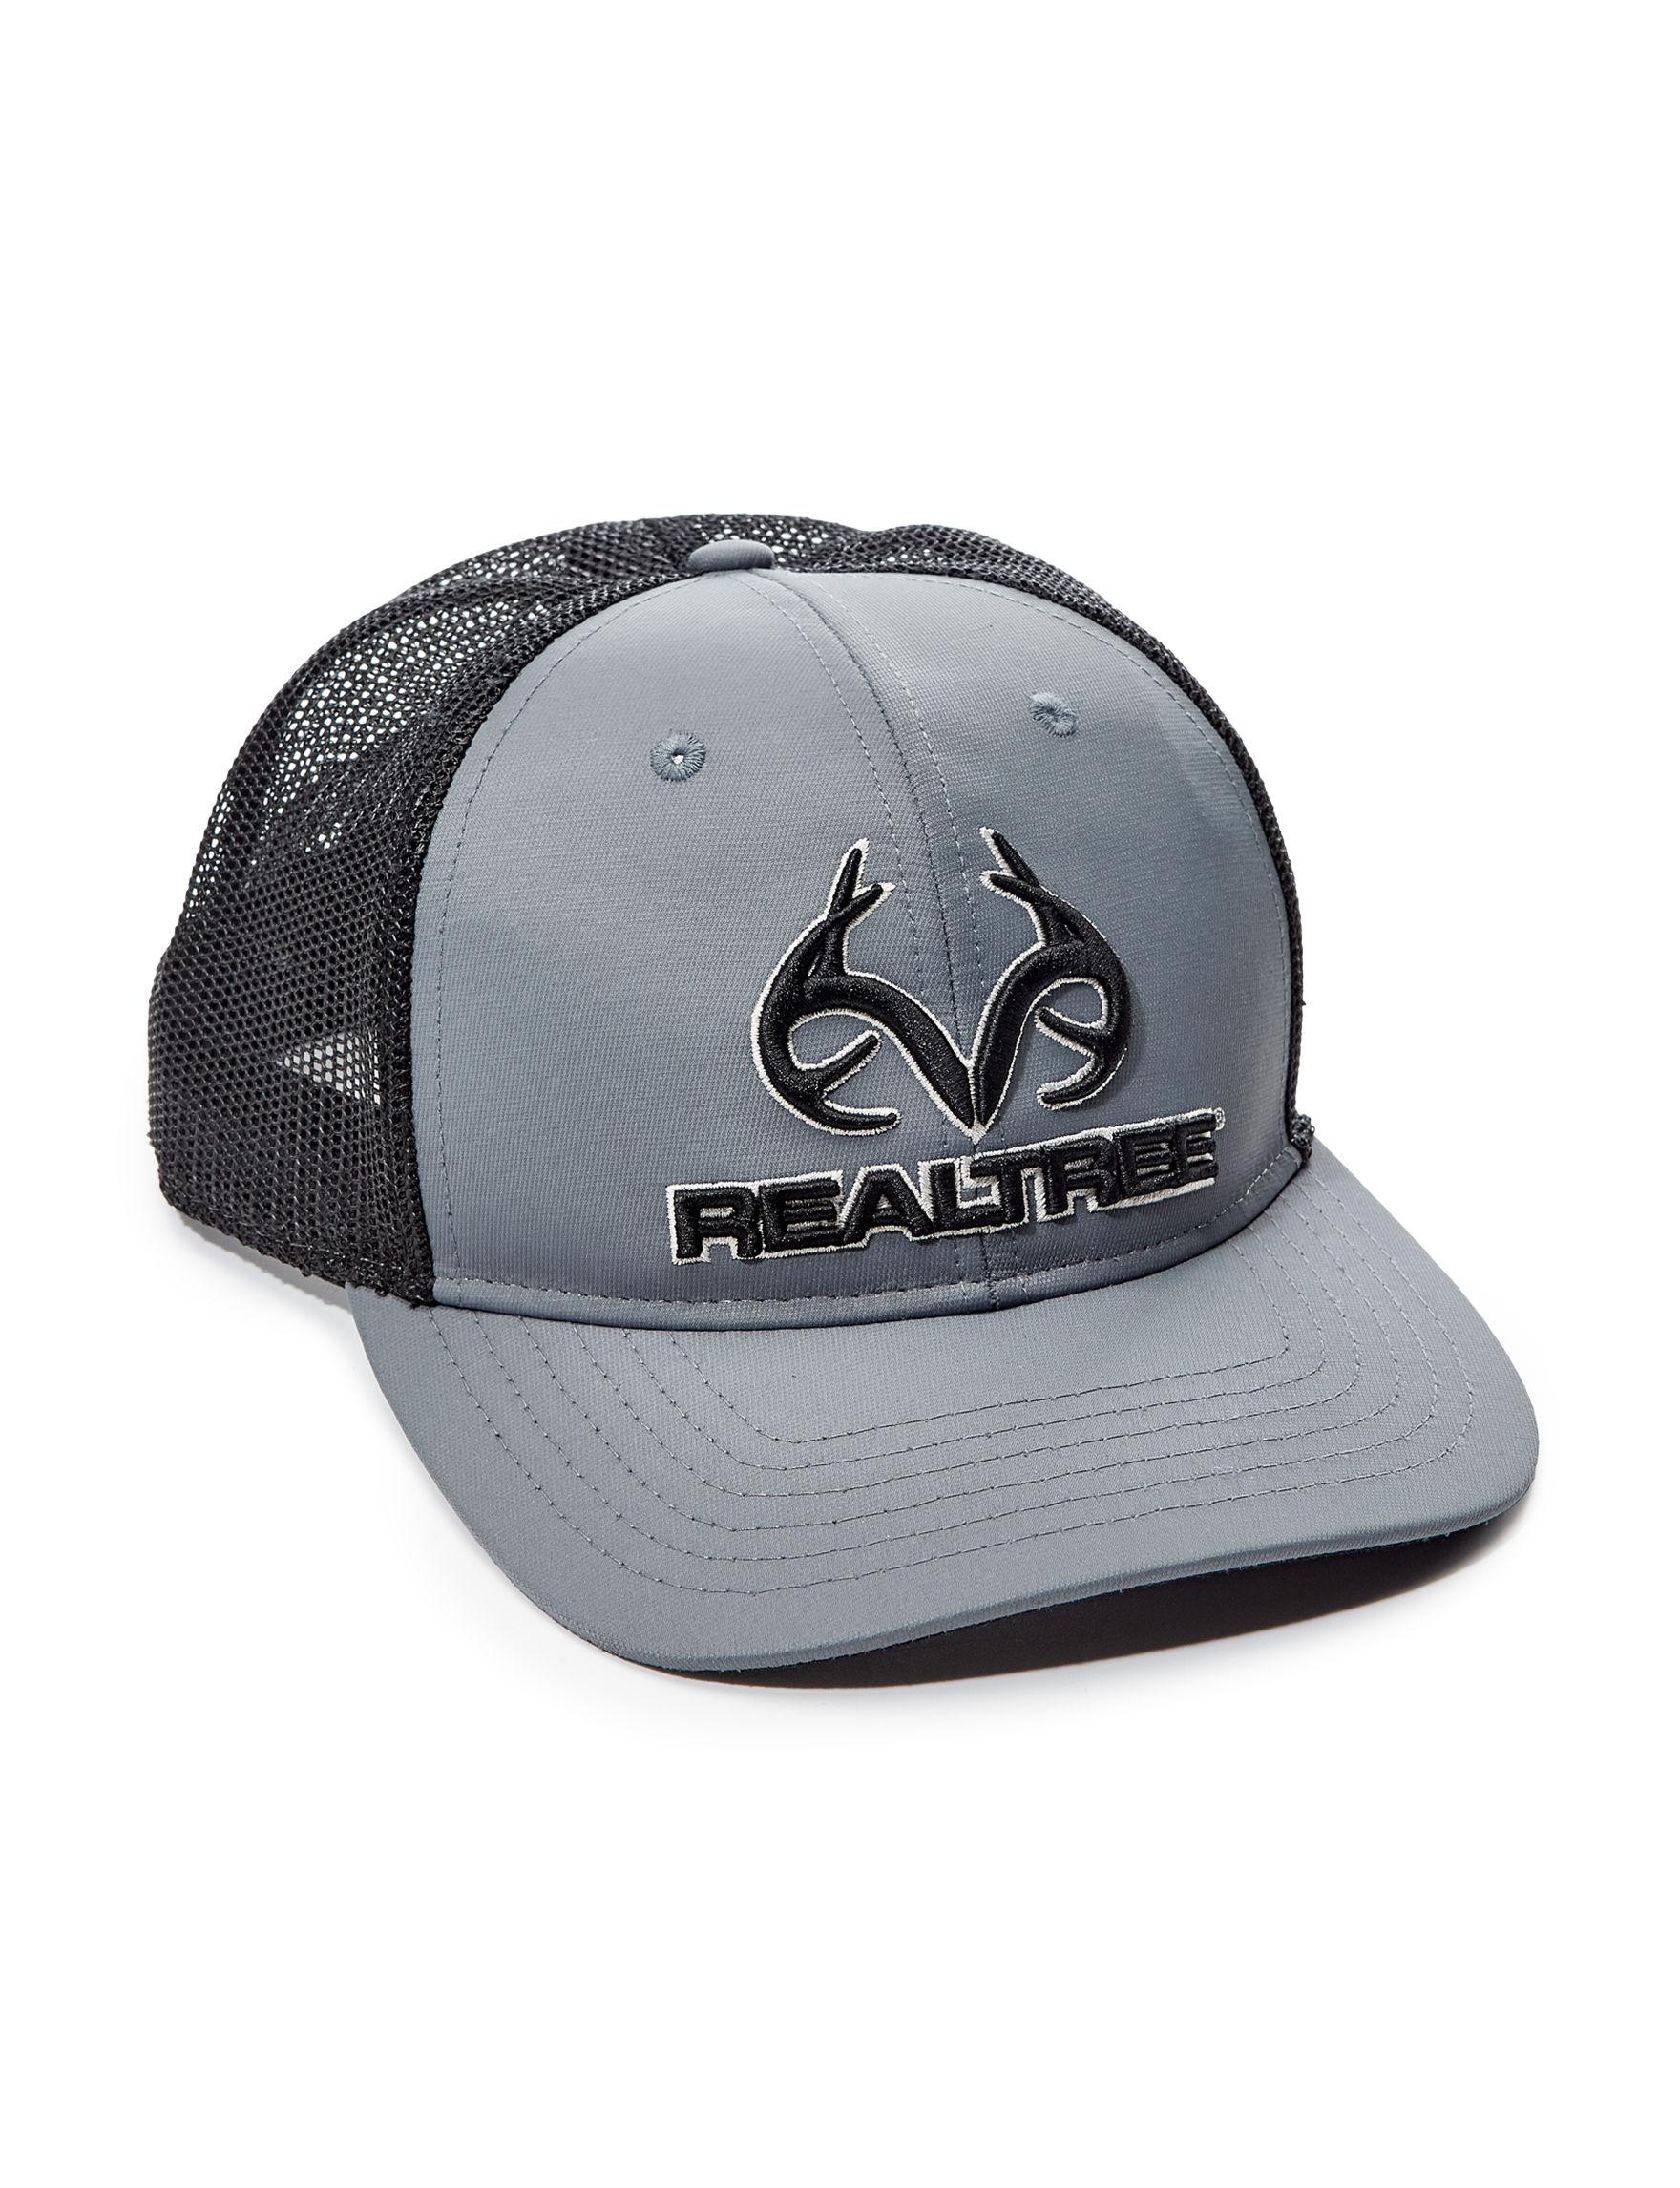 Realtree Grey / Black Hats & Headwear Baseball Caps